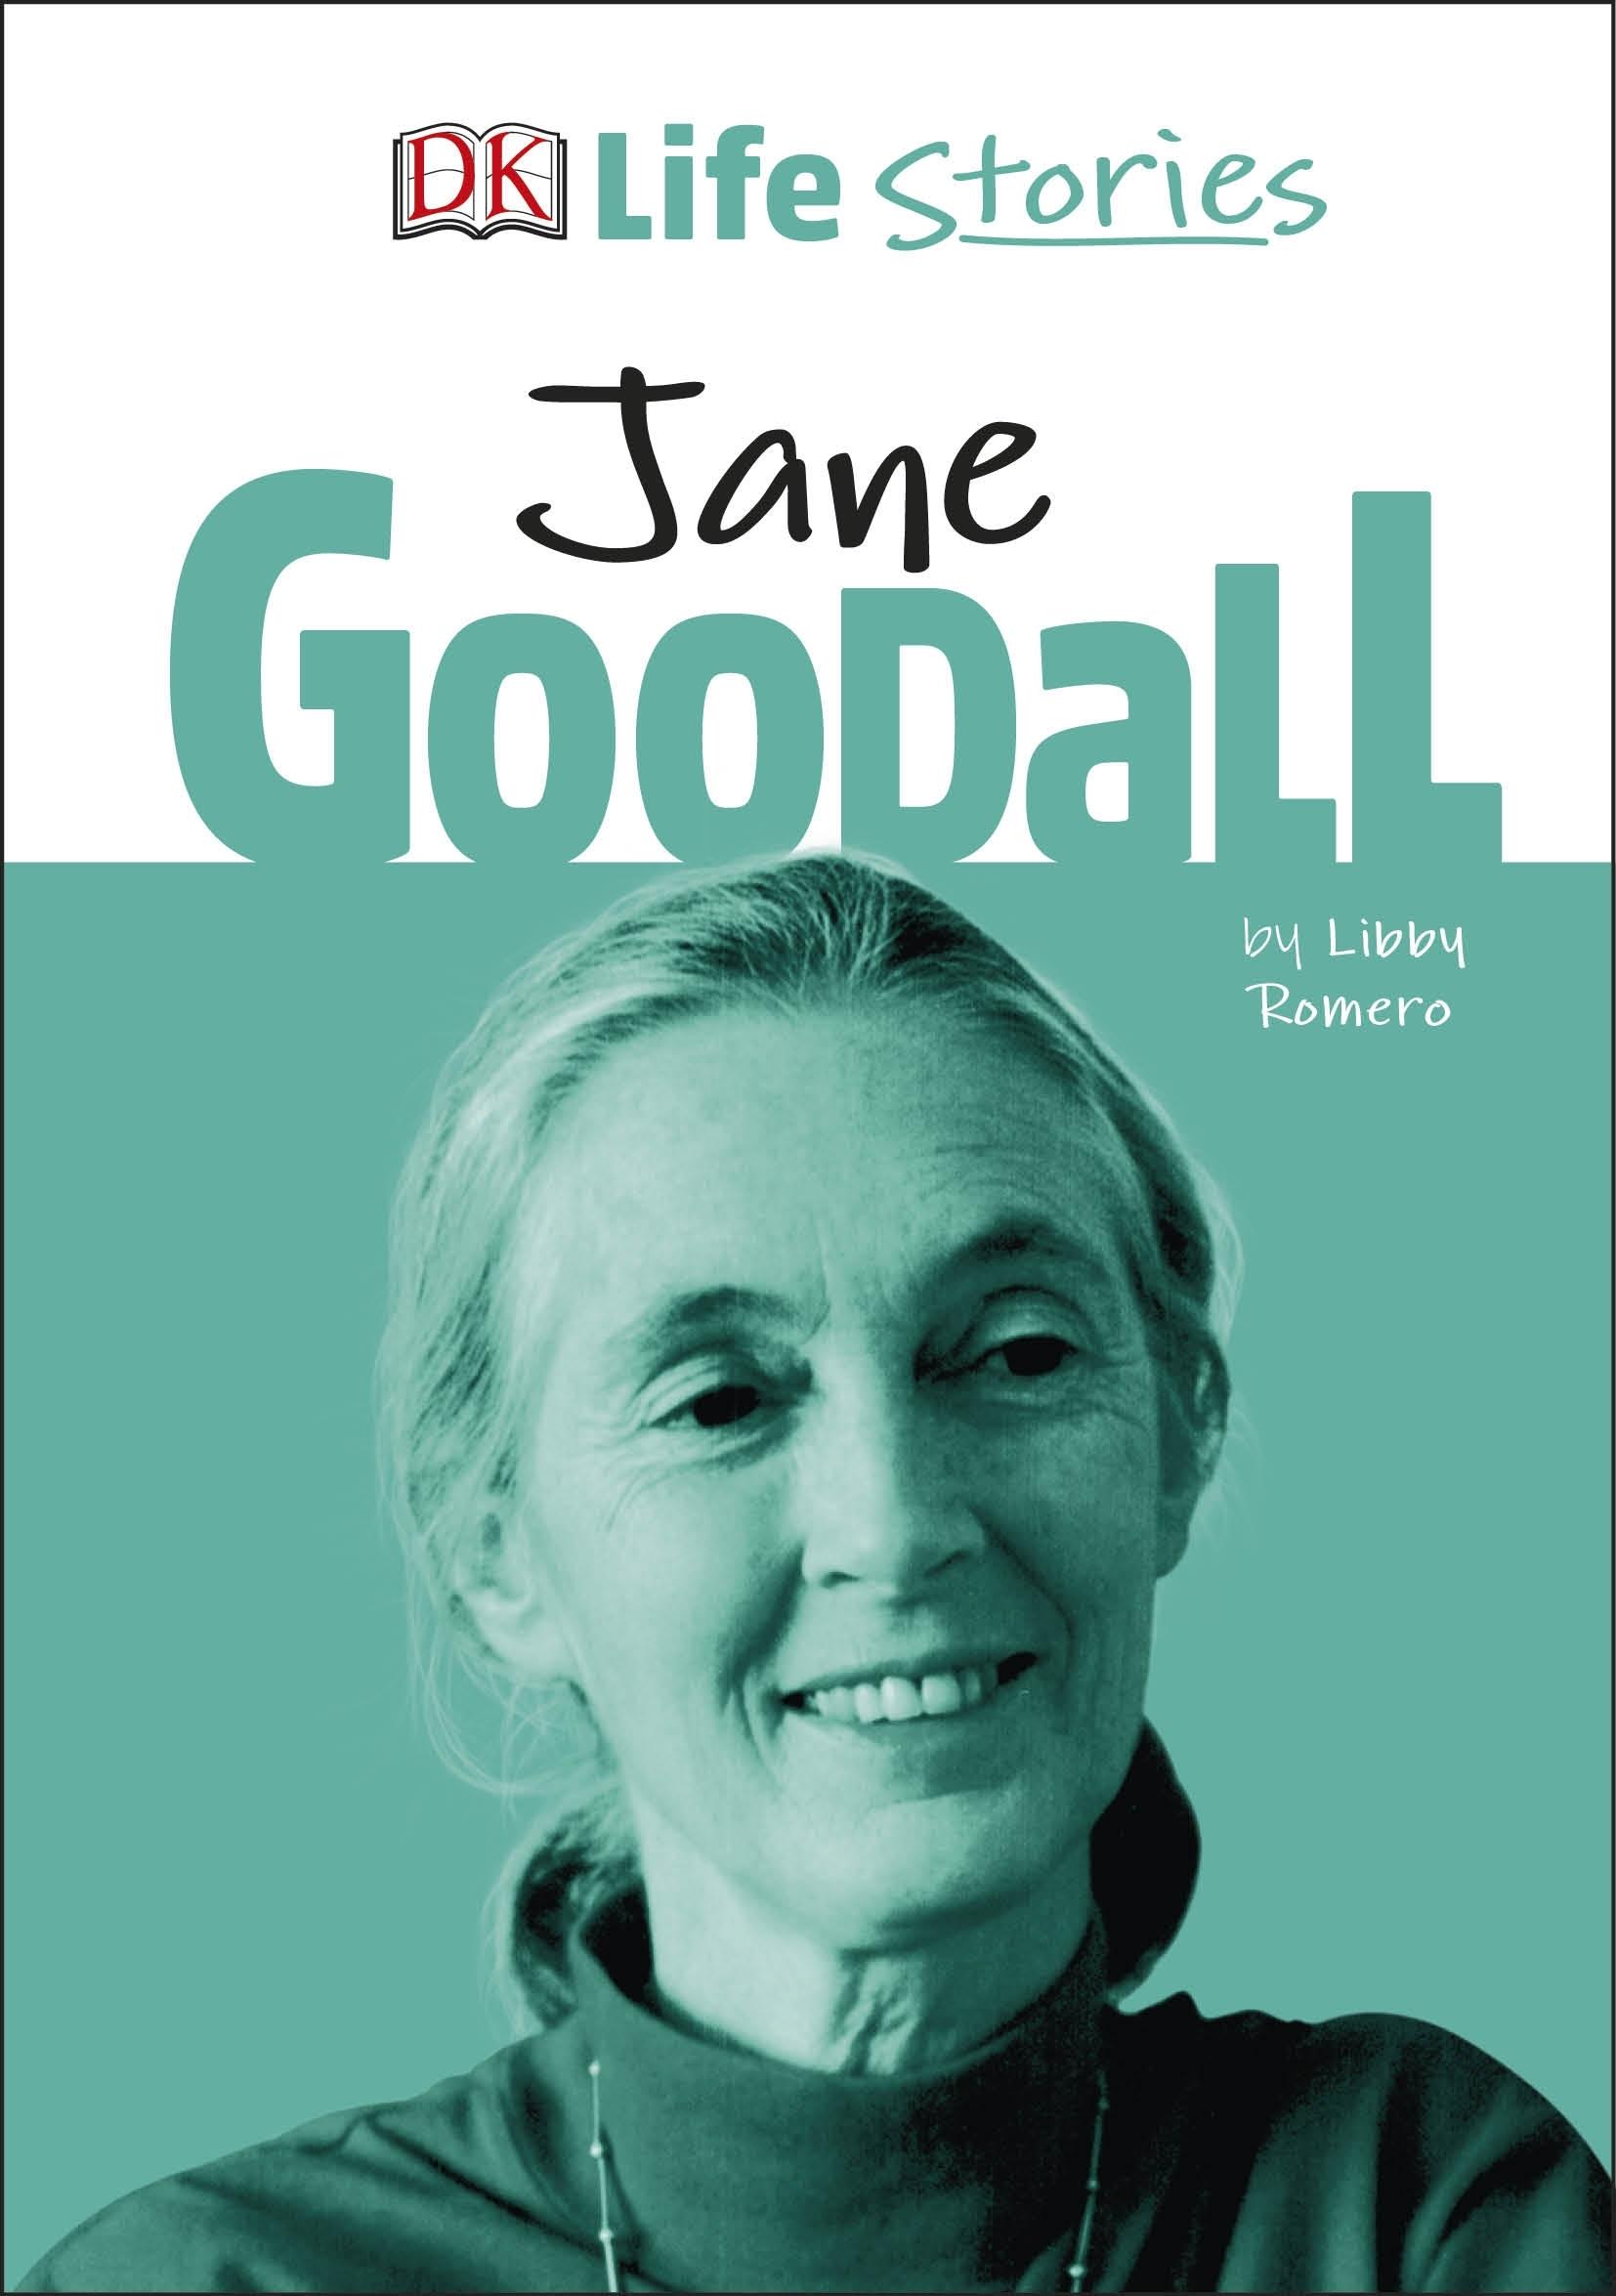 DK Life Stories Jane Goodall